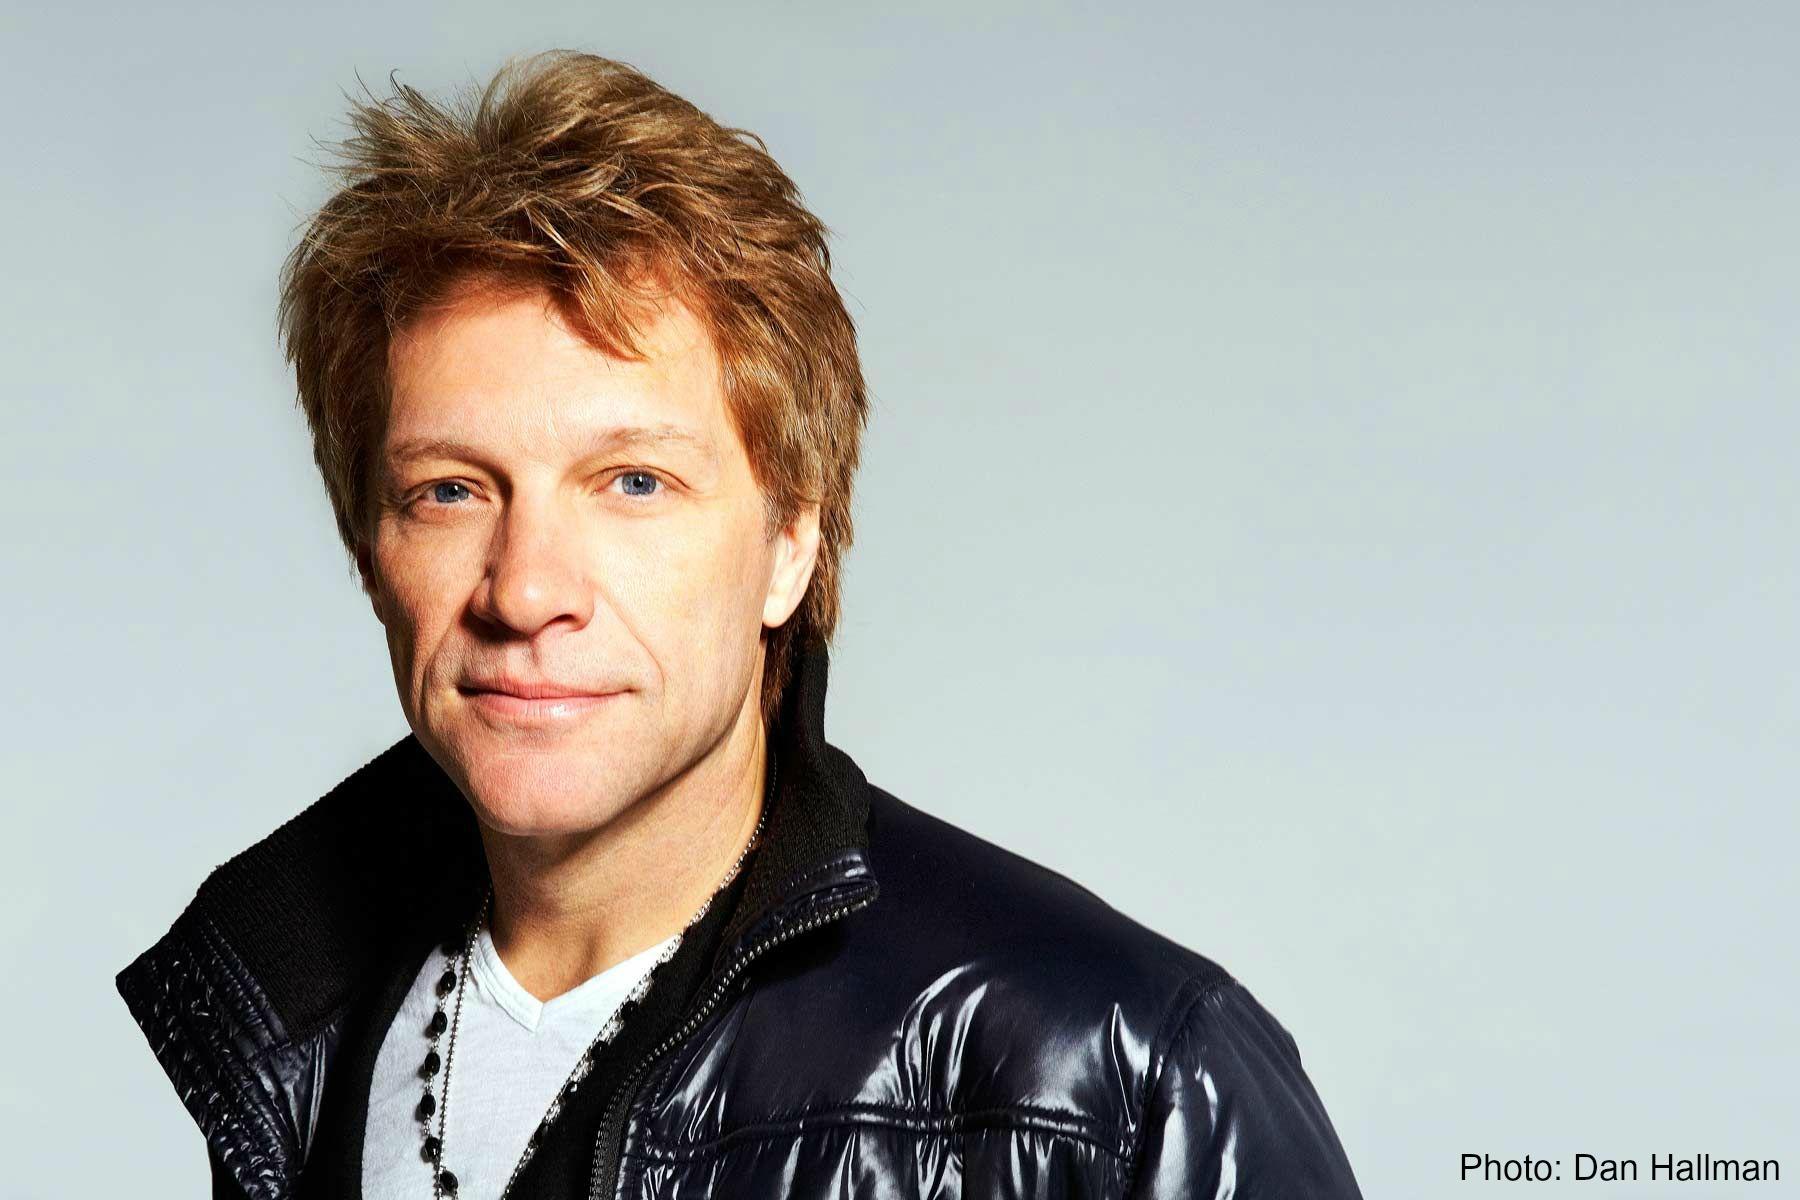 Jon Bon Jovi: Italian of the Week | Sons of Italy Blog